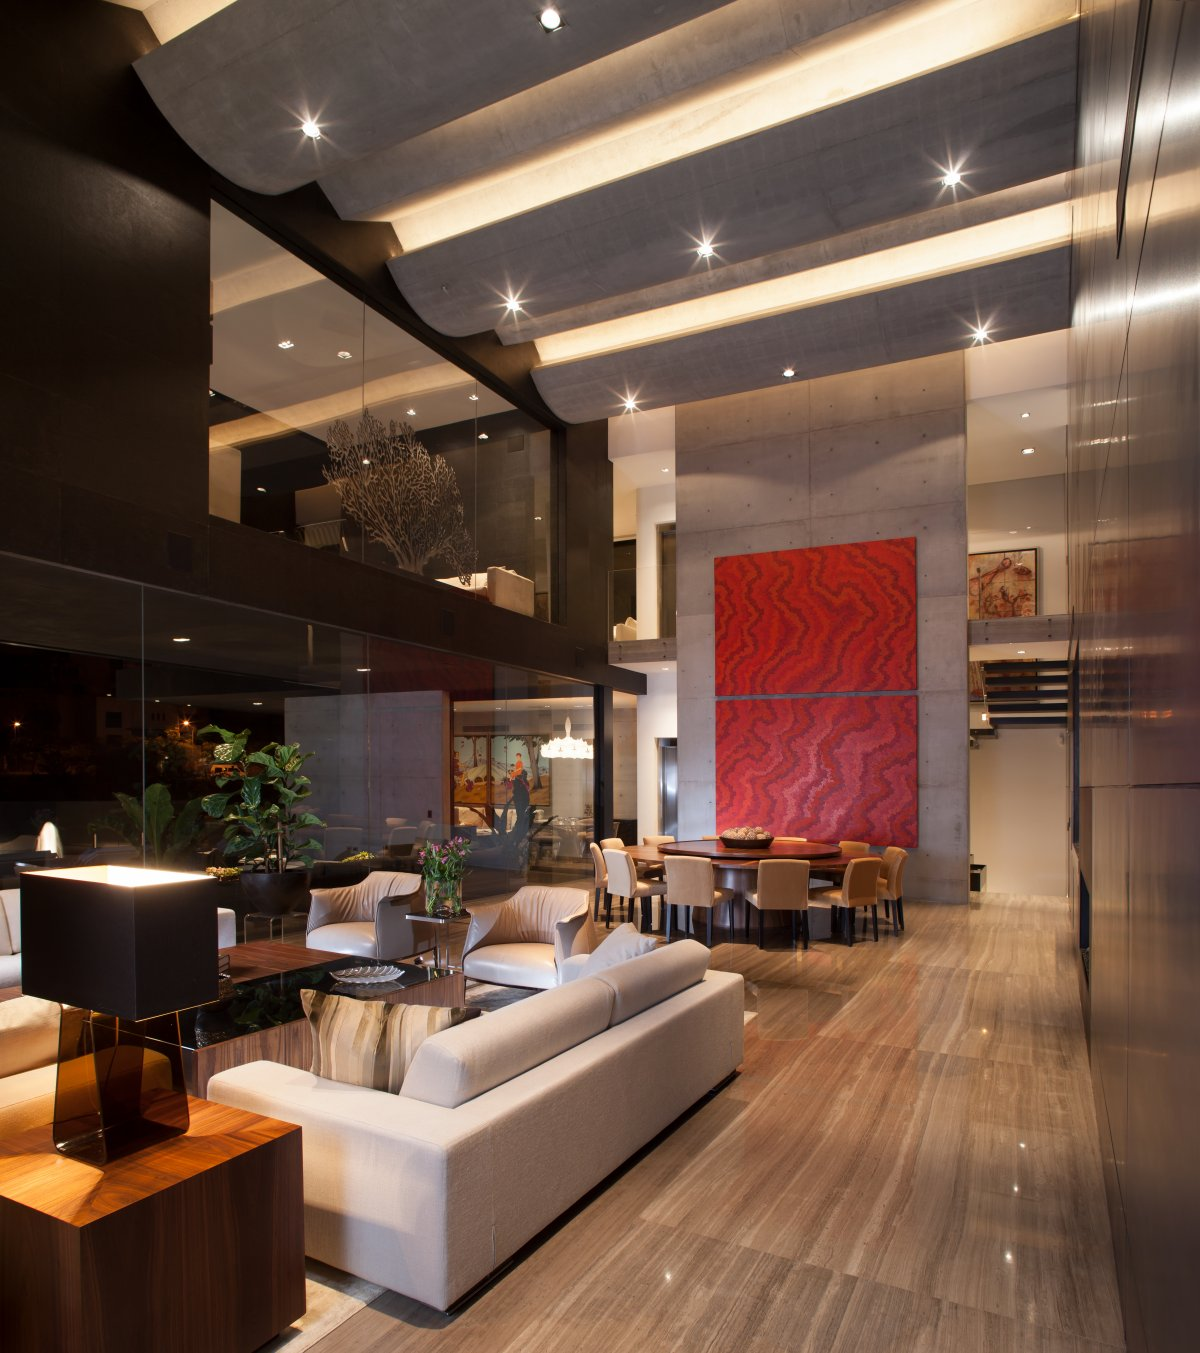 Dining Table, Sofa, Lighting, Stylish Contemporary Home in Garza Garcia, Mexico